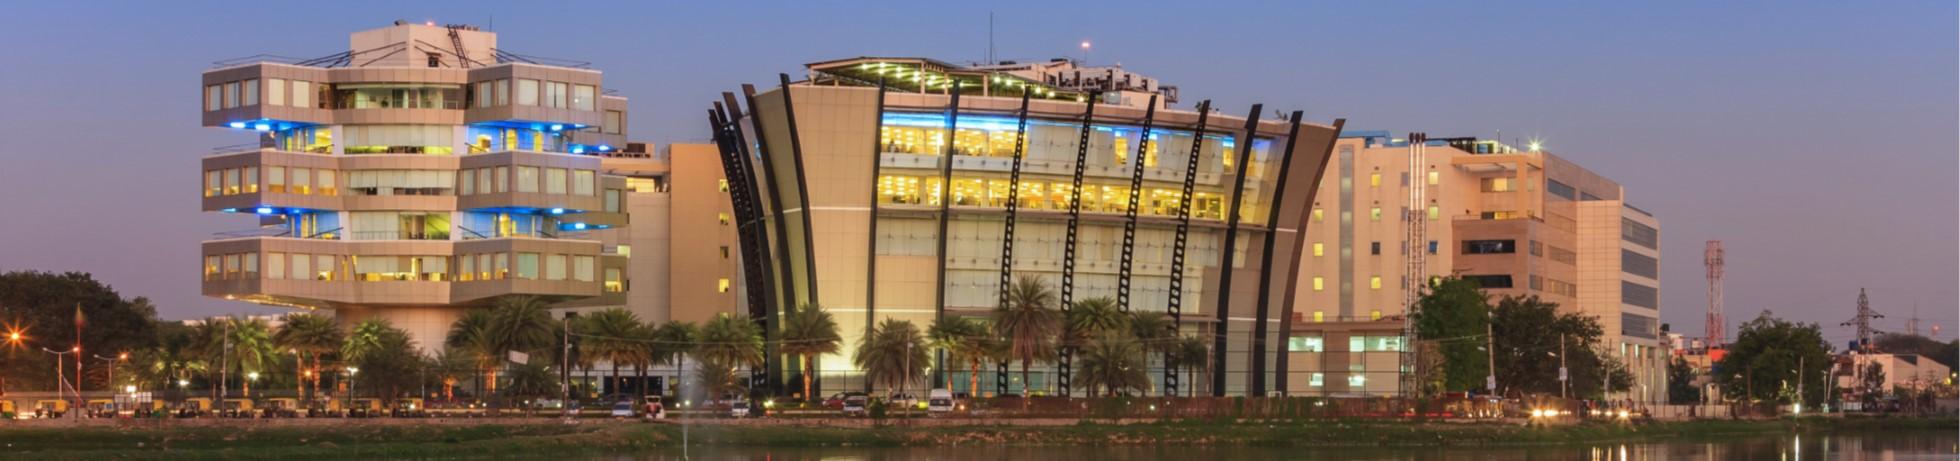 FTC - Bangalore 17 x 4.jpg